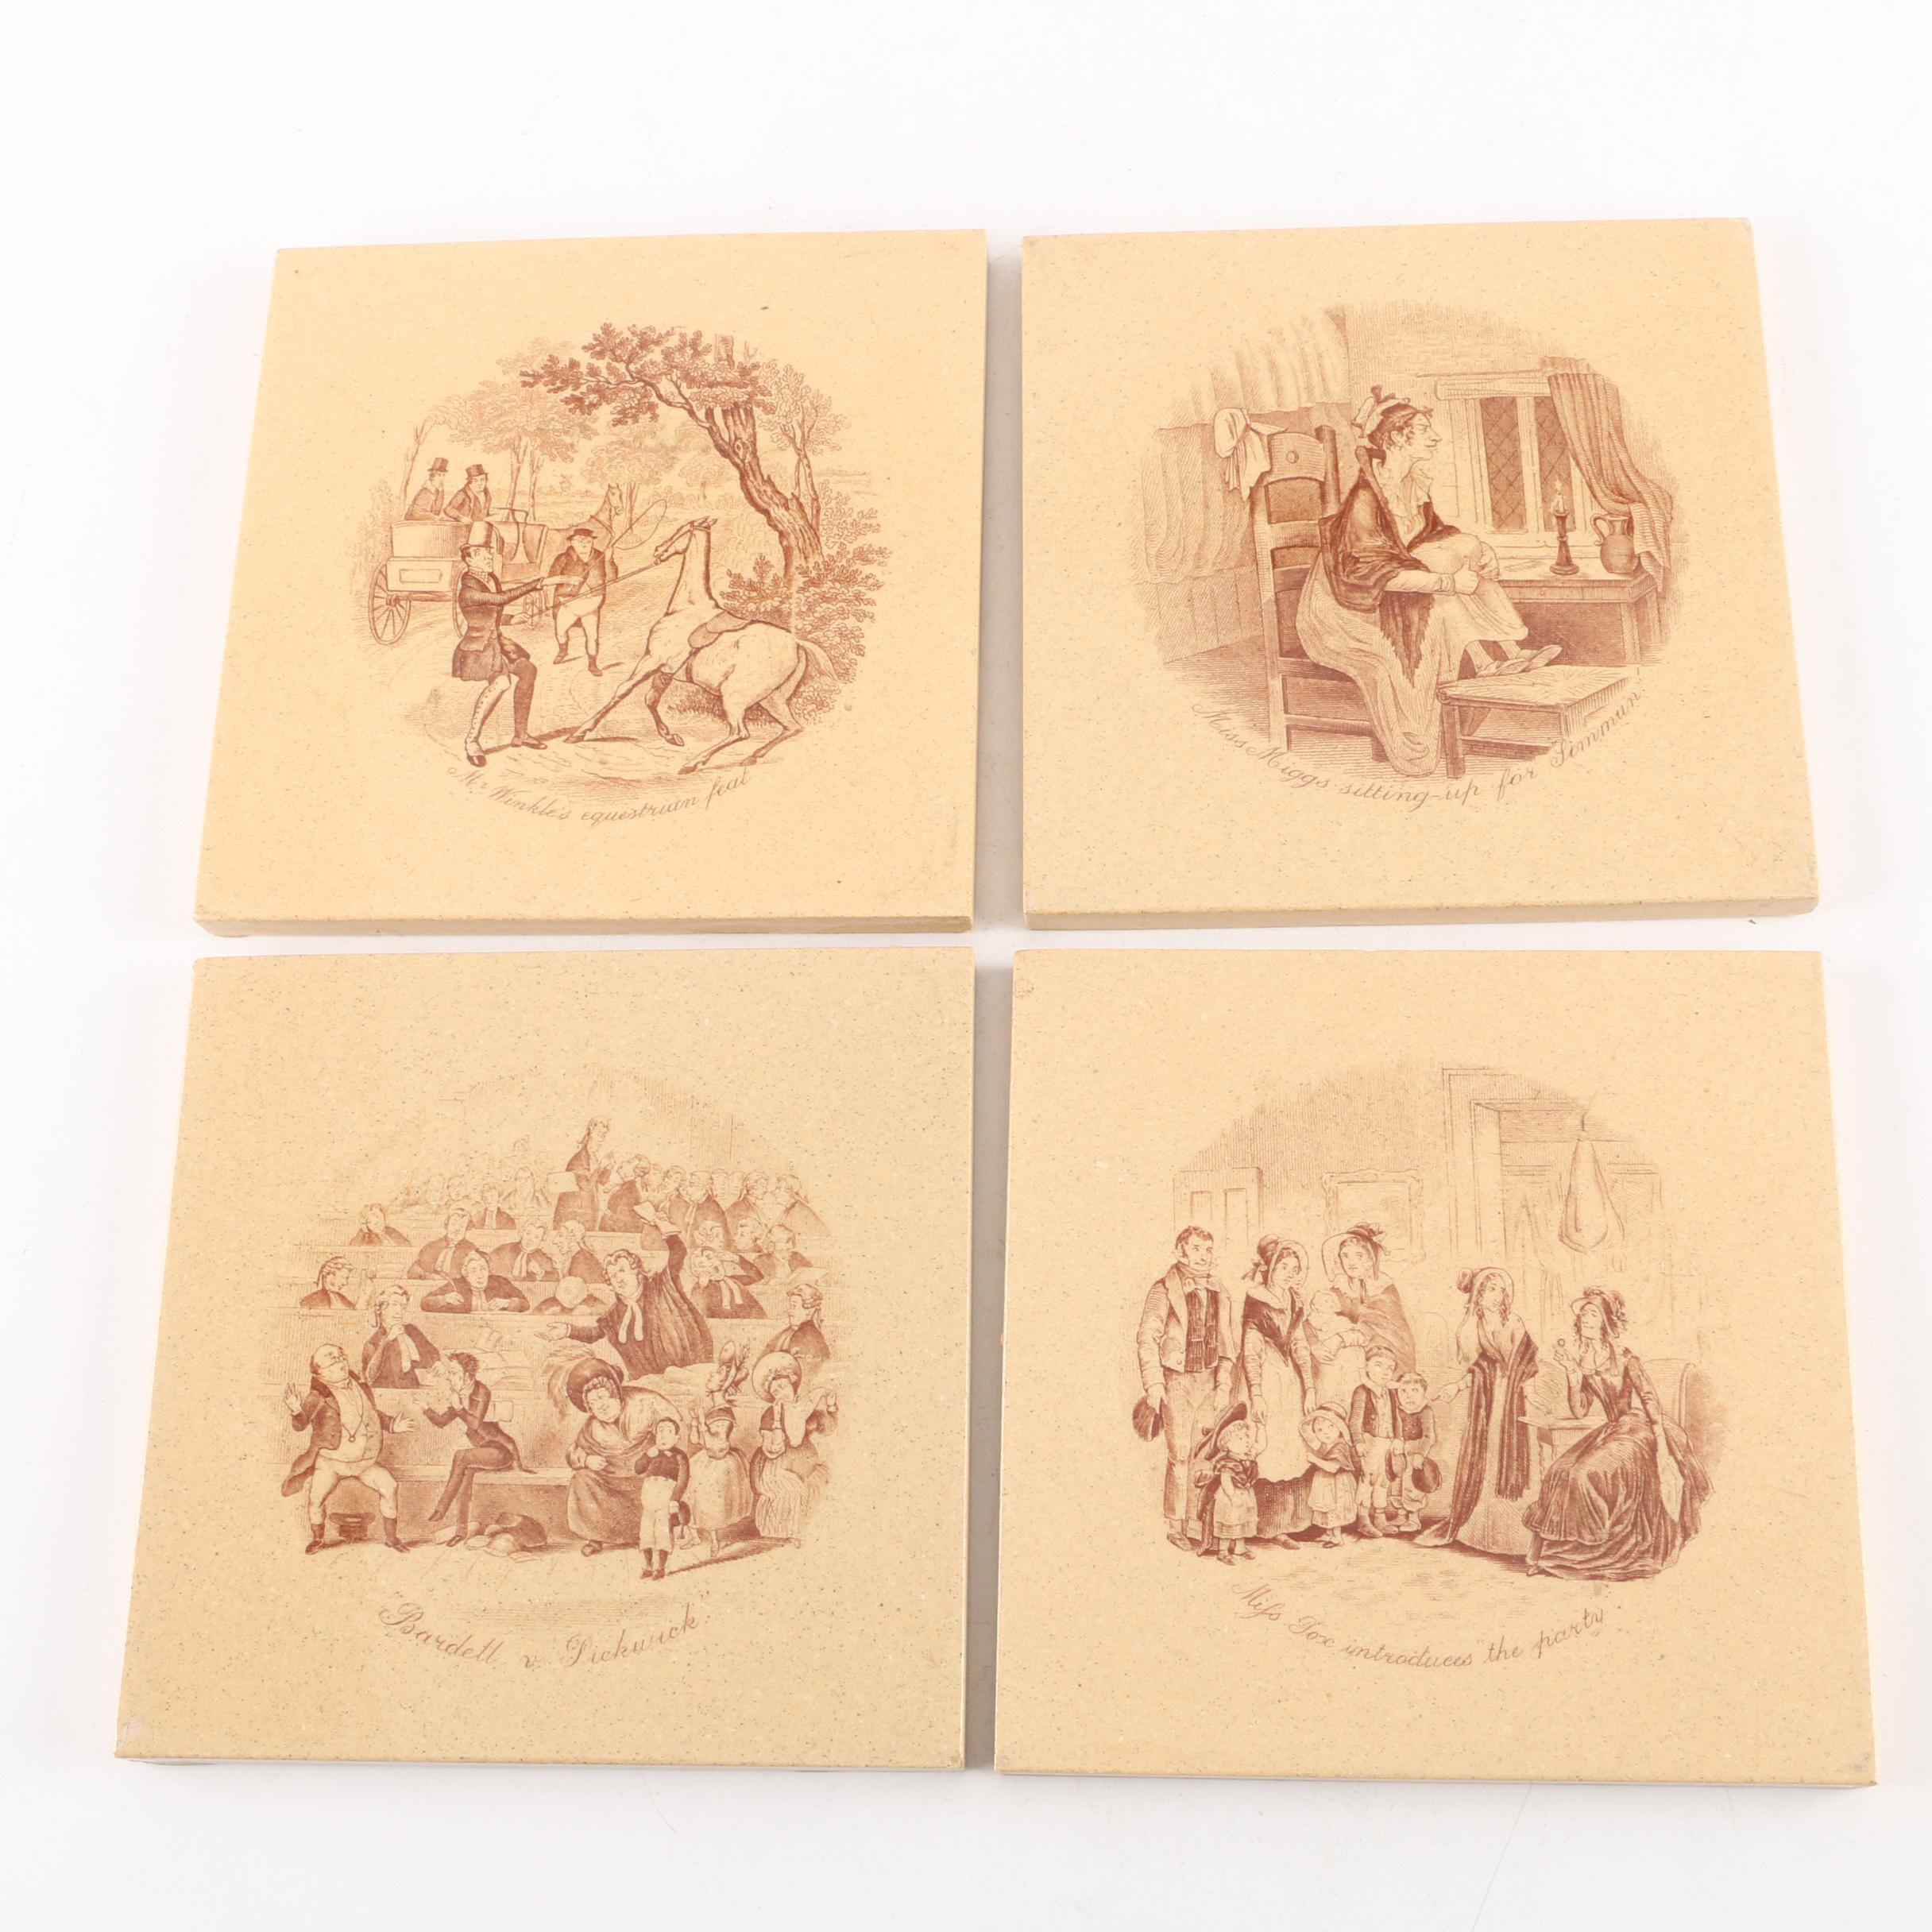 Vintage Ceramic Tiles Depicting Scenes From Charles Dickens Works